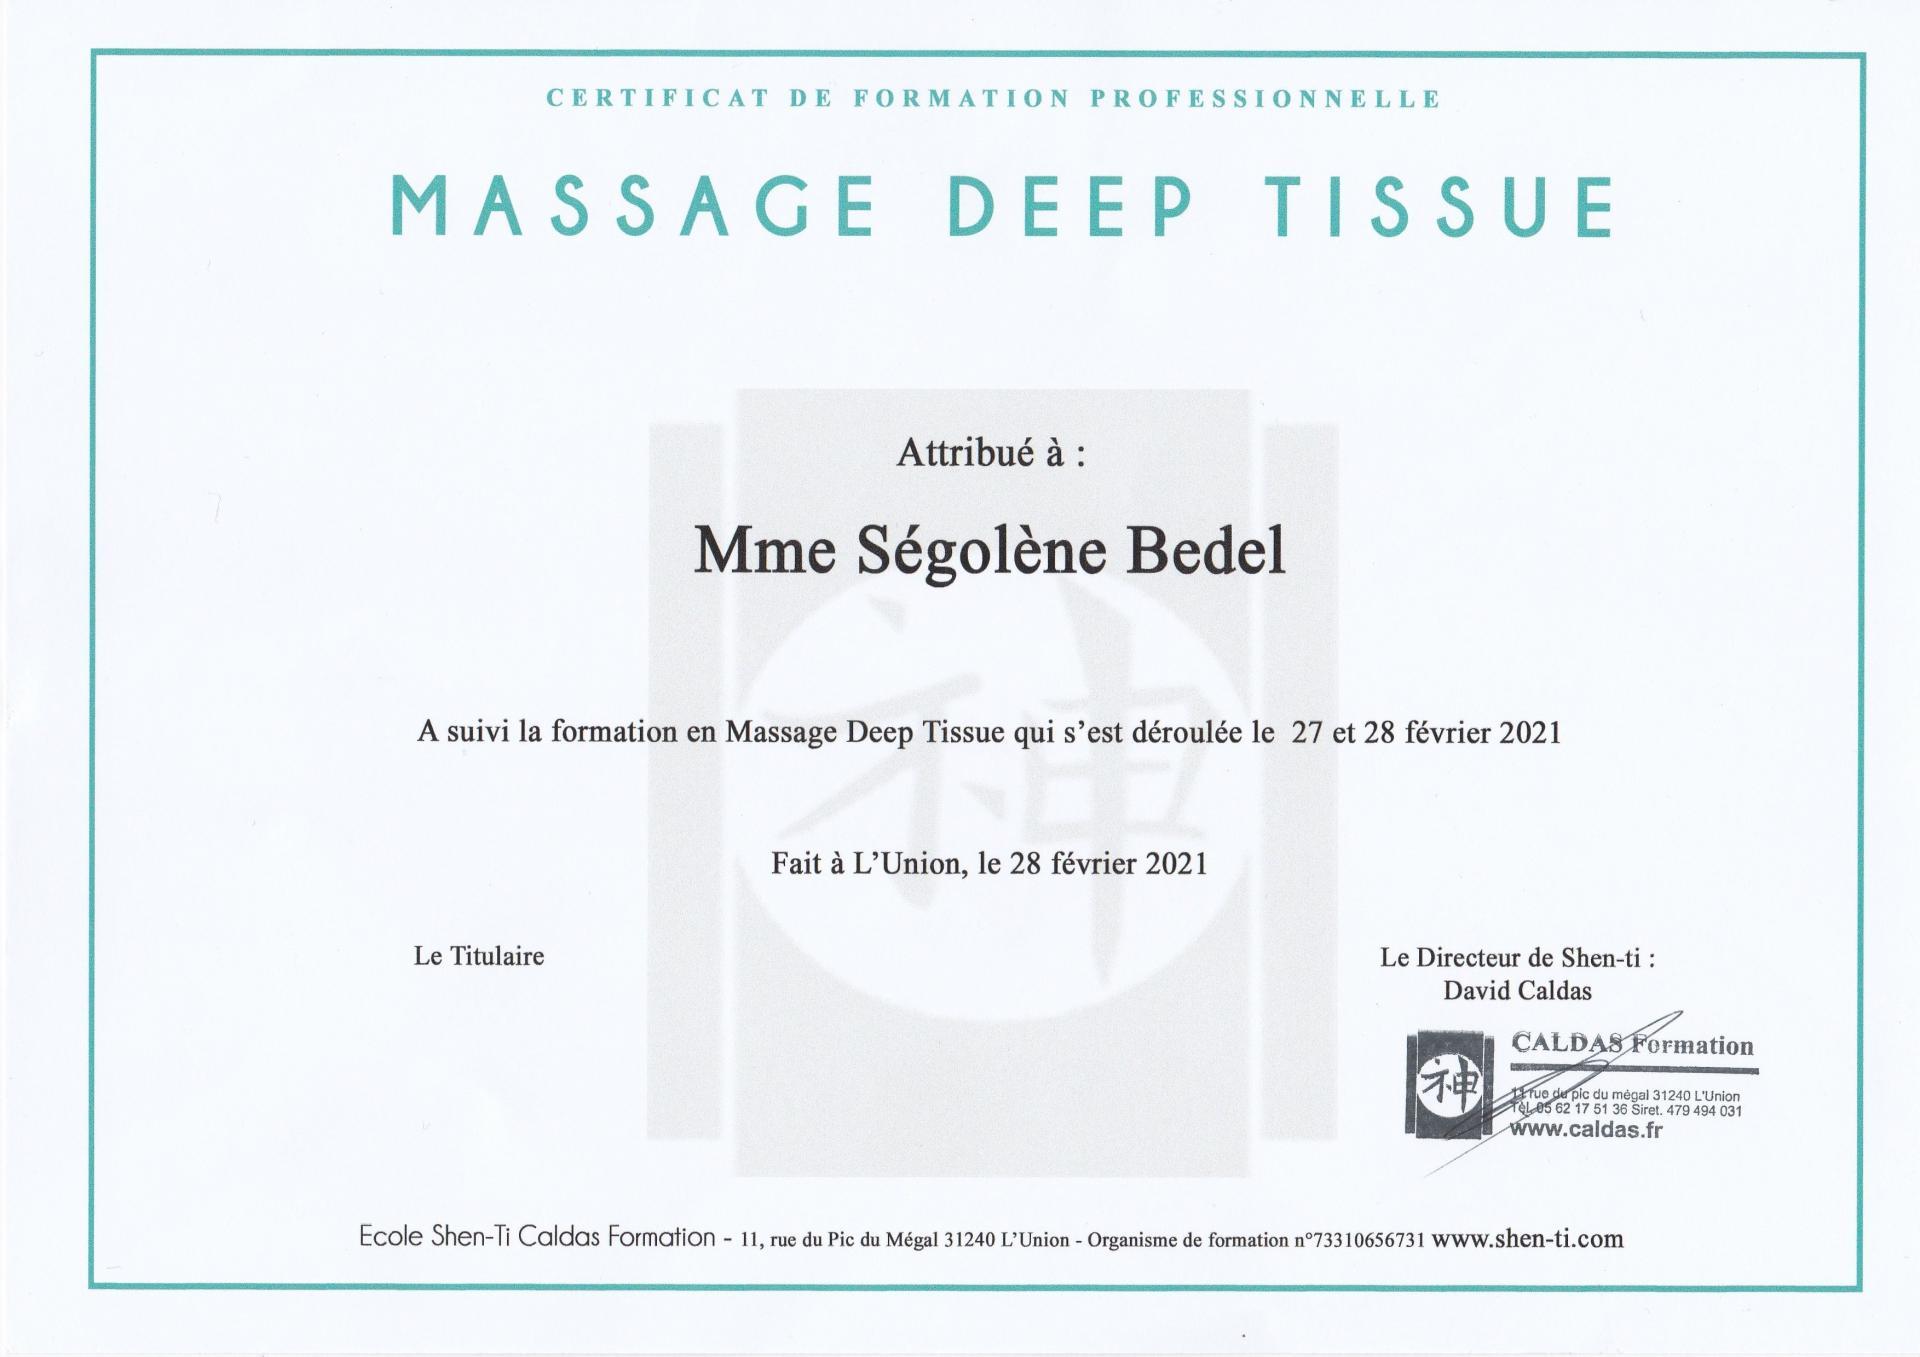 Sego certificat massage deep tissue